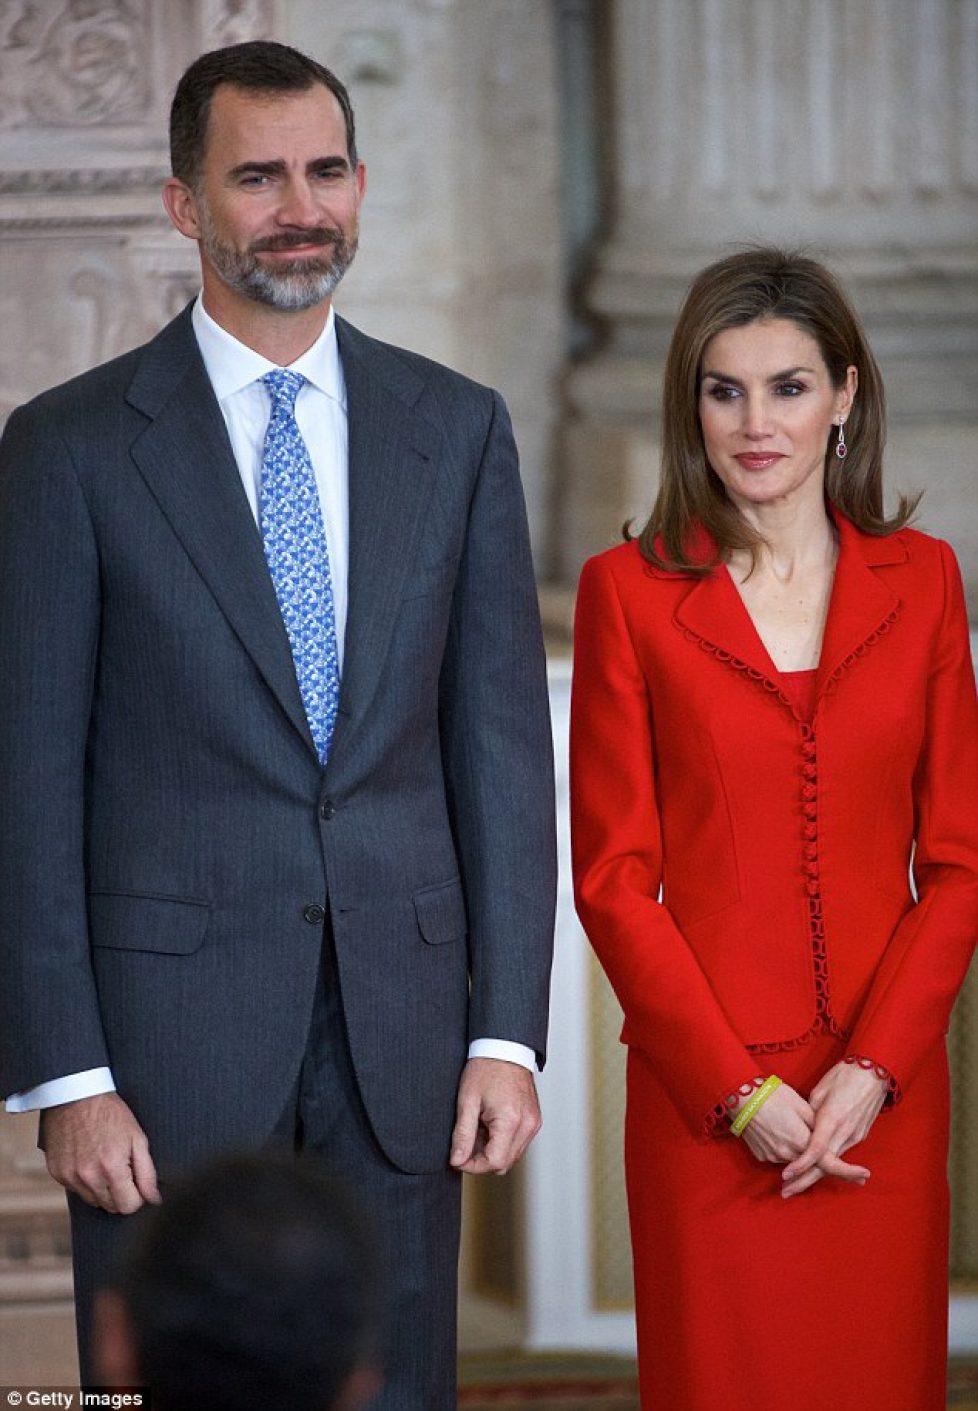 24B8AB2900000578-2911758-MADRID_SPAIN_JANUARY_15_King_Felipe_VI_of_Spain_and_Queen_Letizi-a-2_1421334080423